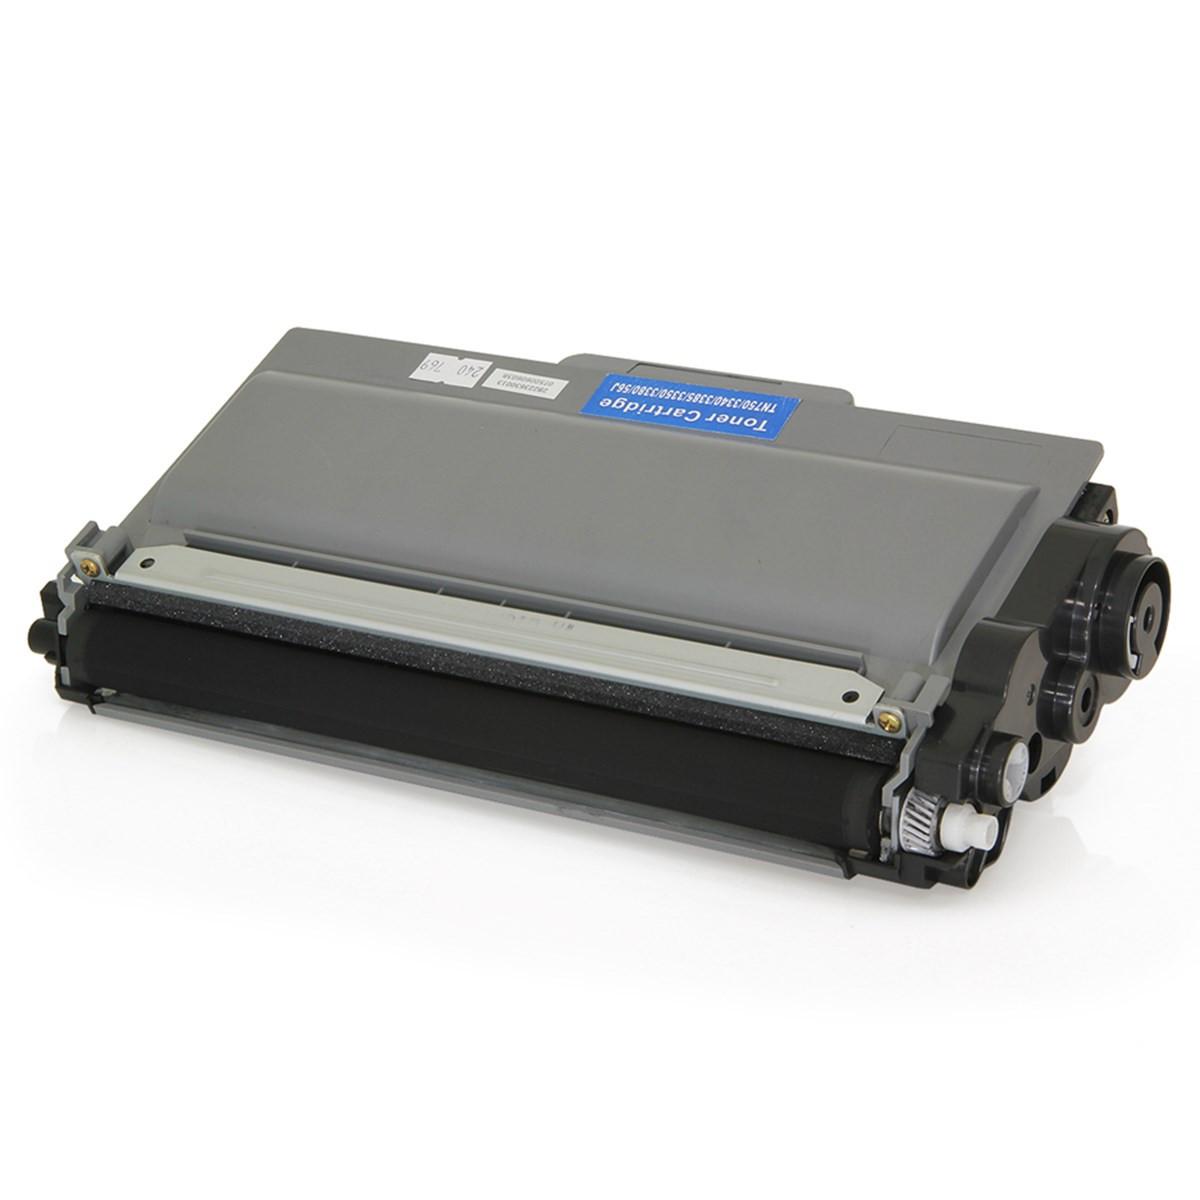 Toner Compatível com Brother TN3392 | DCP8157DN HL6182DW MFC8952DW MFC8952DWT | Importado 12k